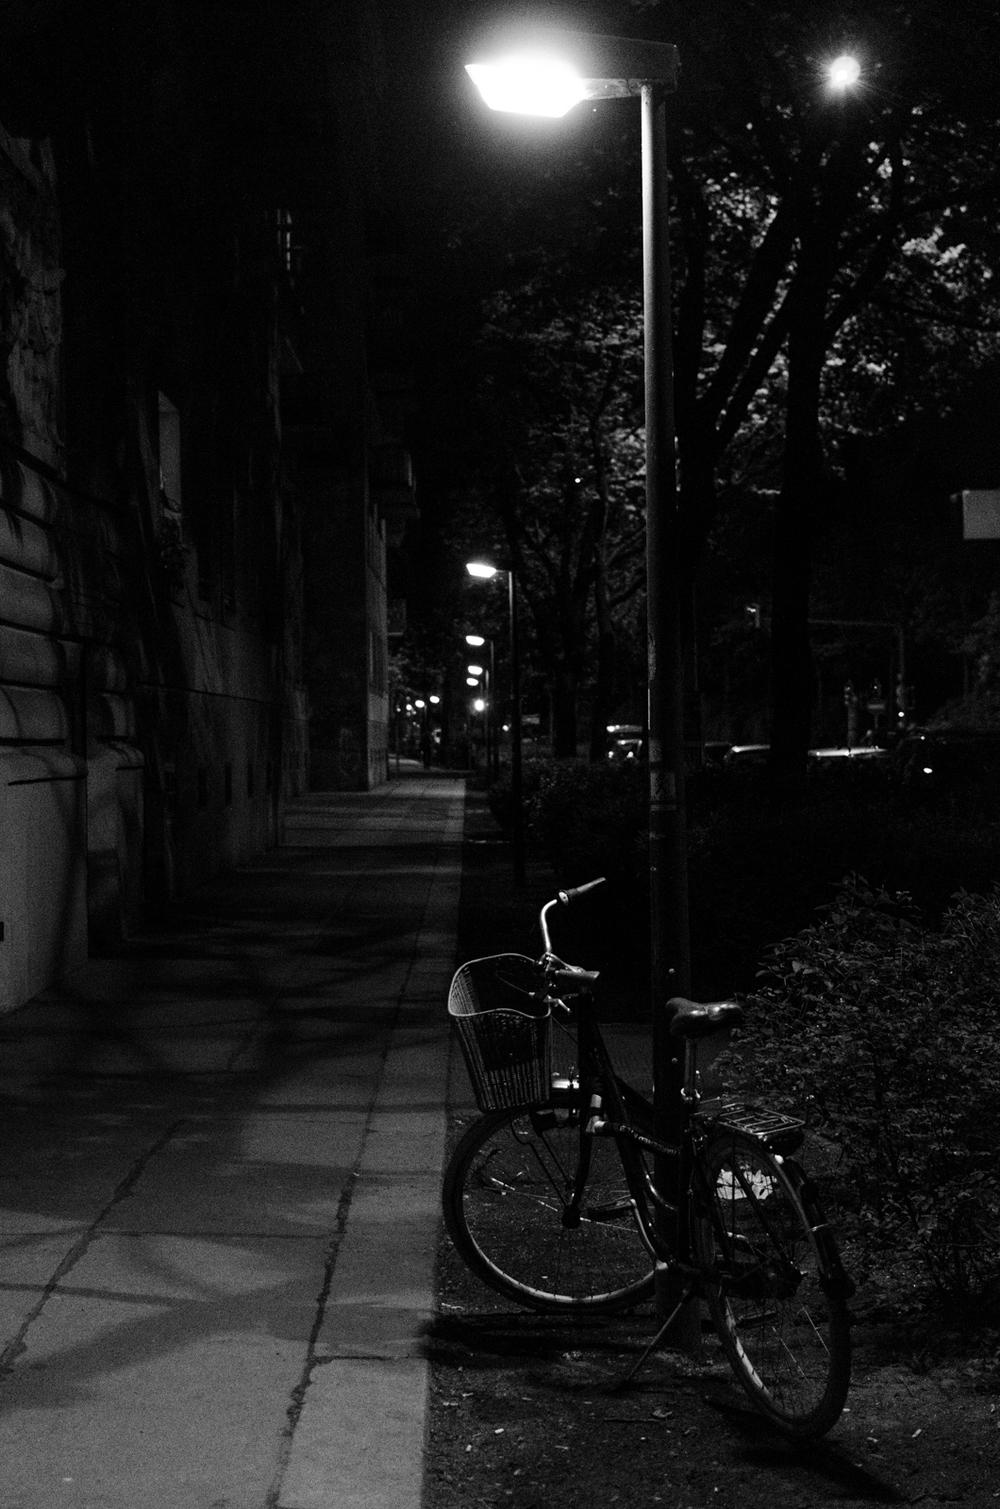 Project 365: #108 - Night Ride